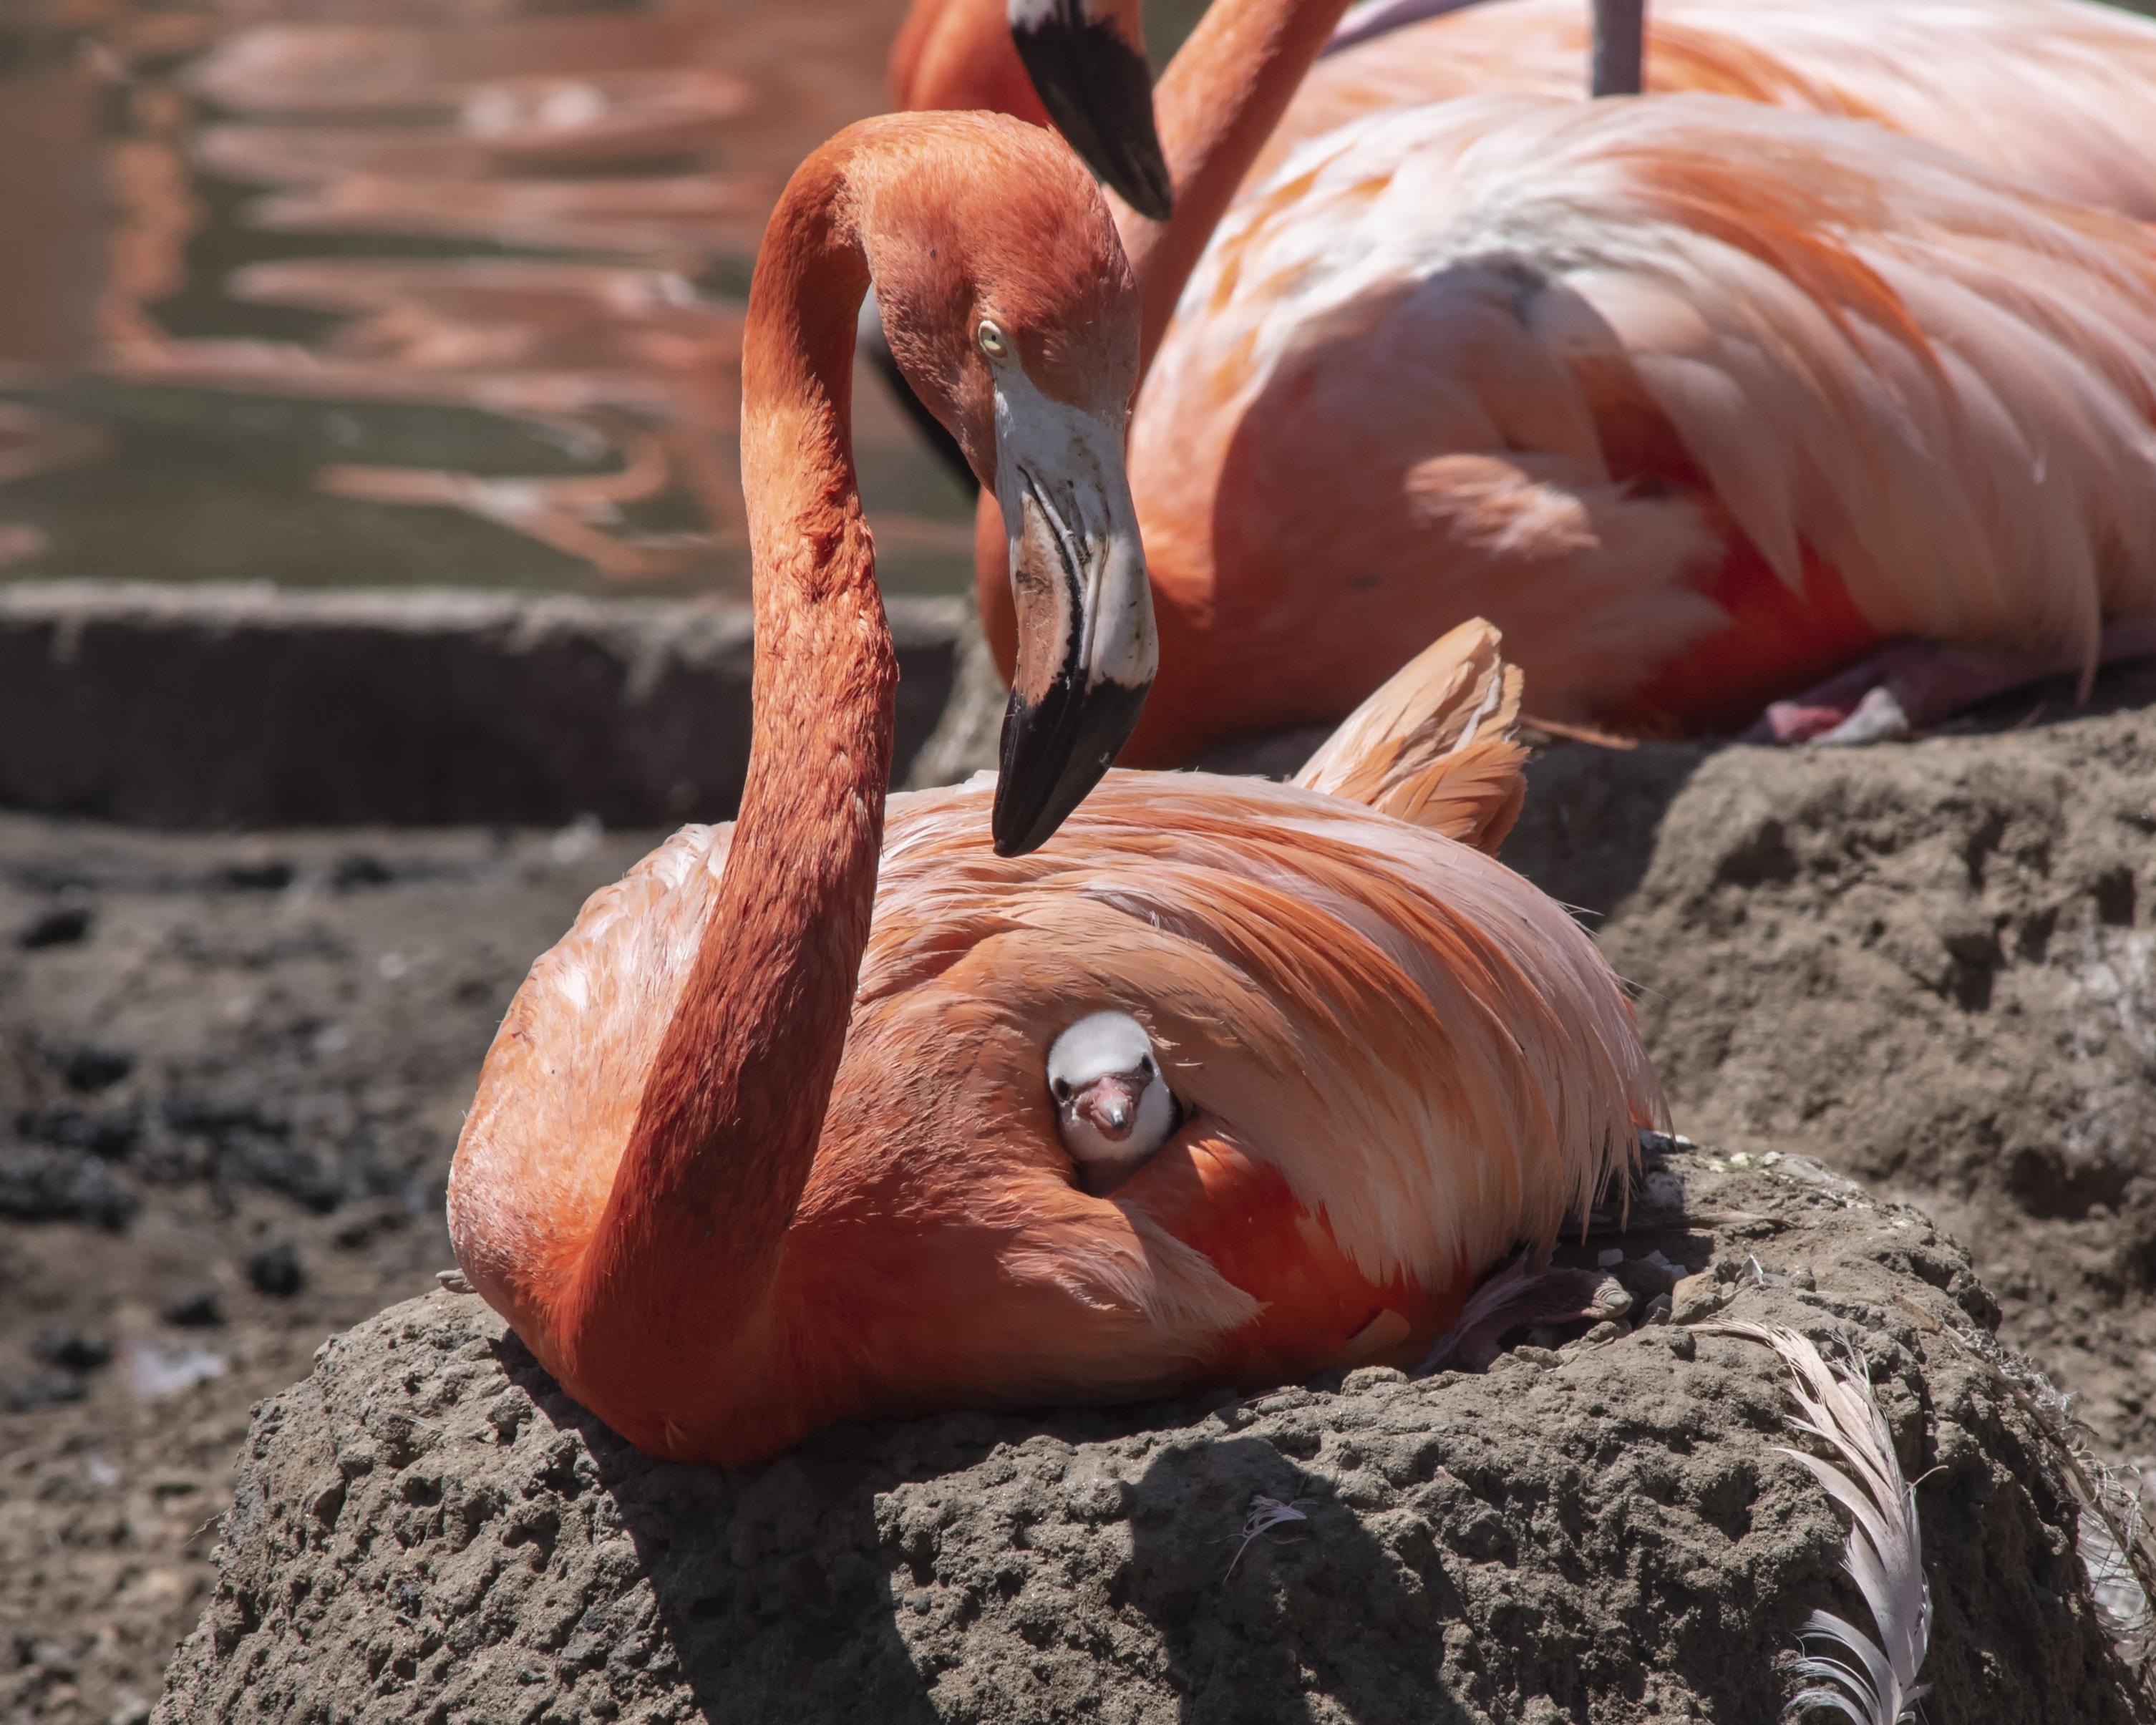 Seaworld Welcomes New Flamingo Chicks To The Flamboyance